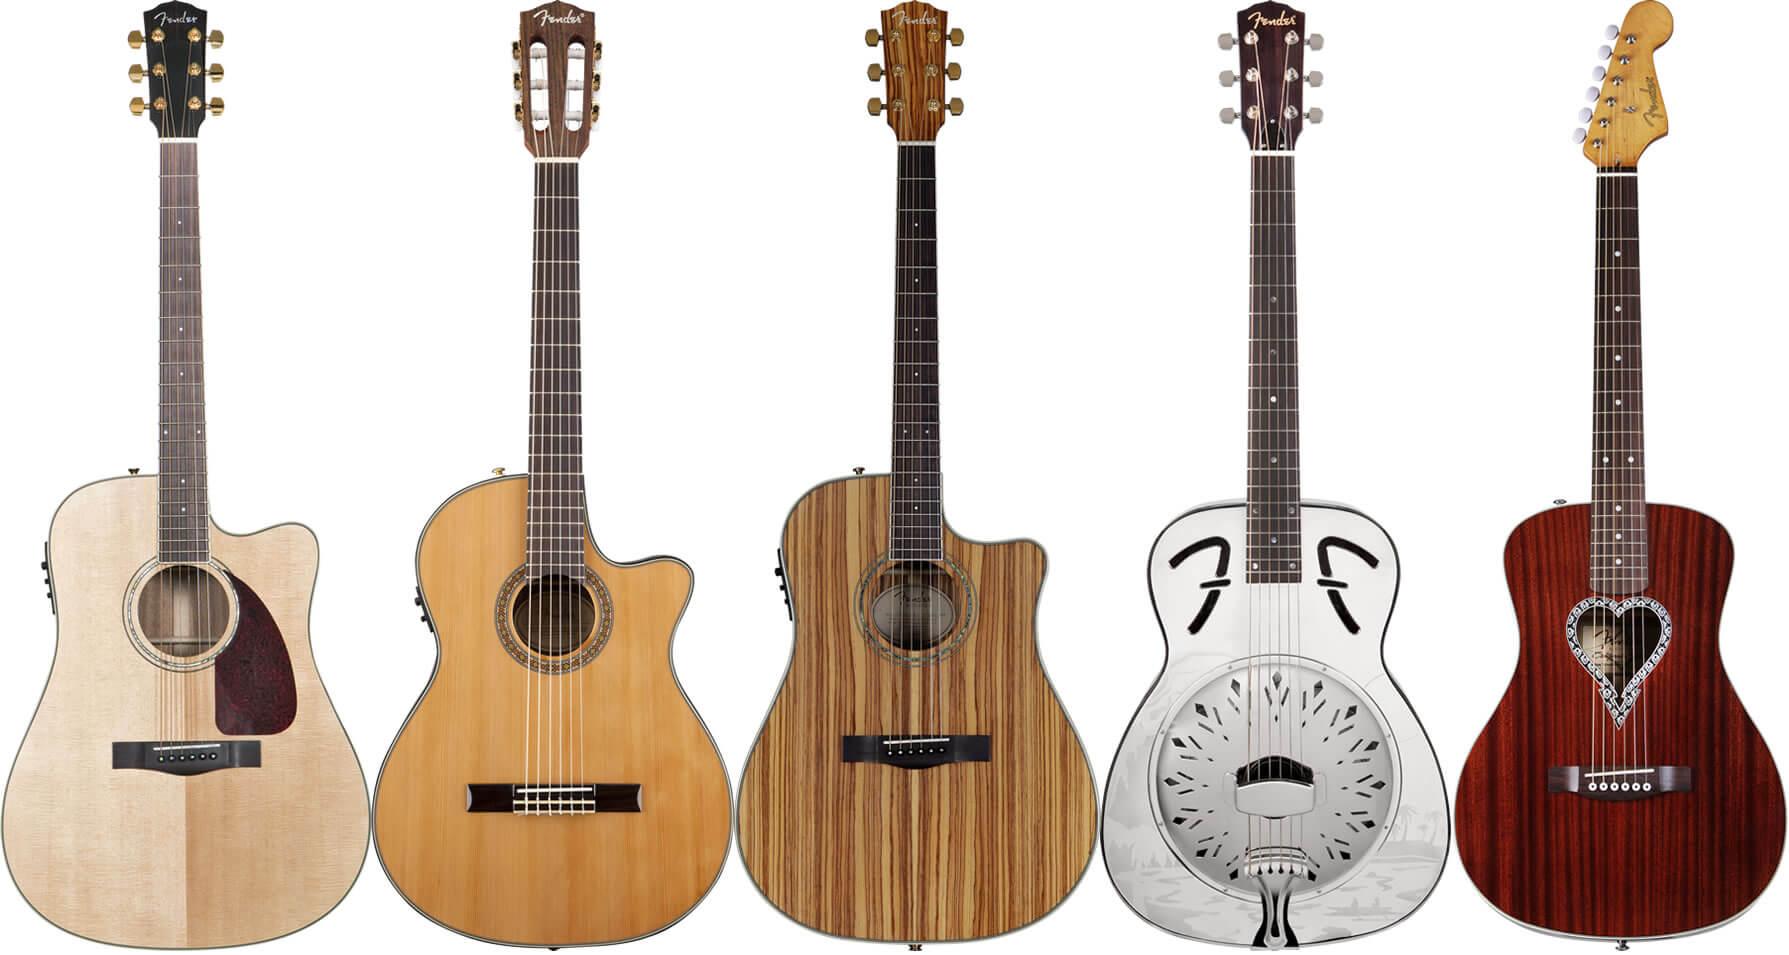 Fender(フェンダー)のアコースティックギター